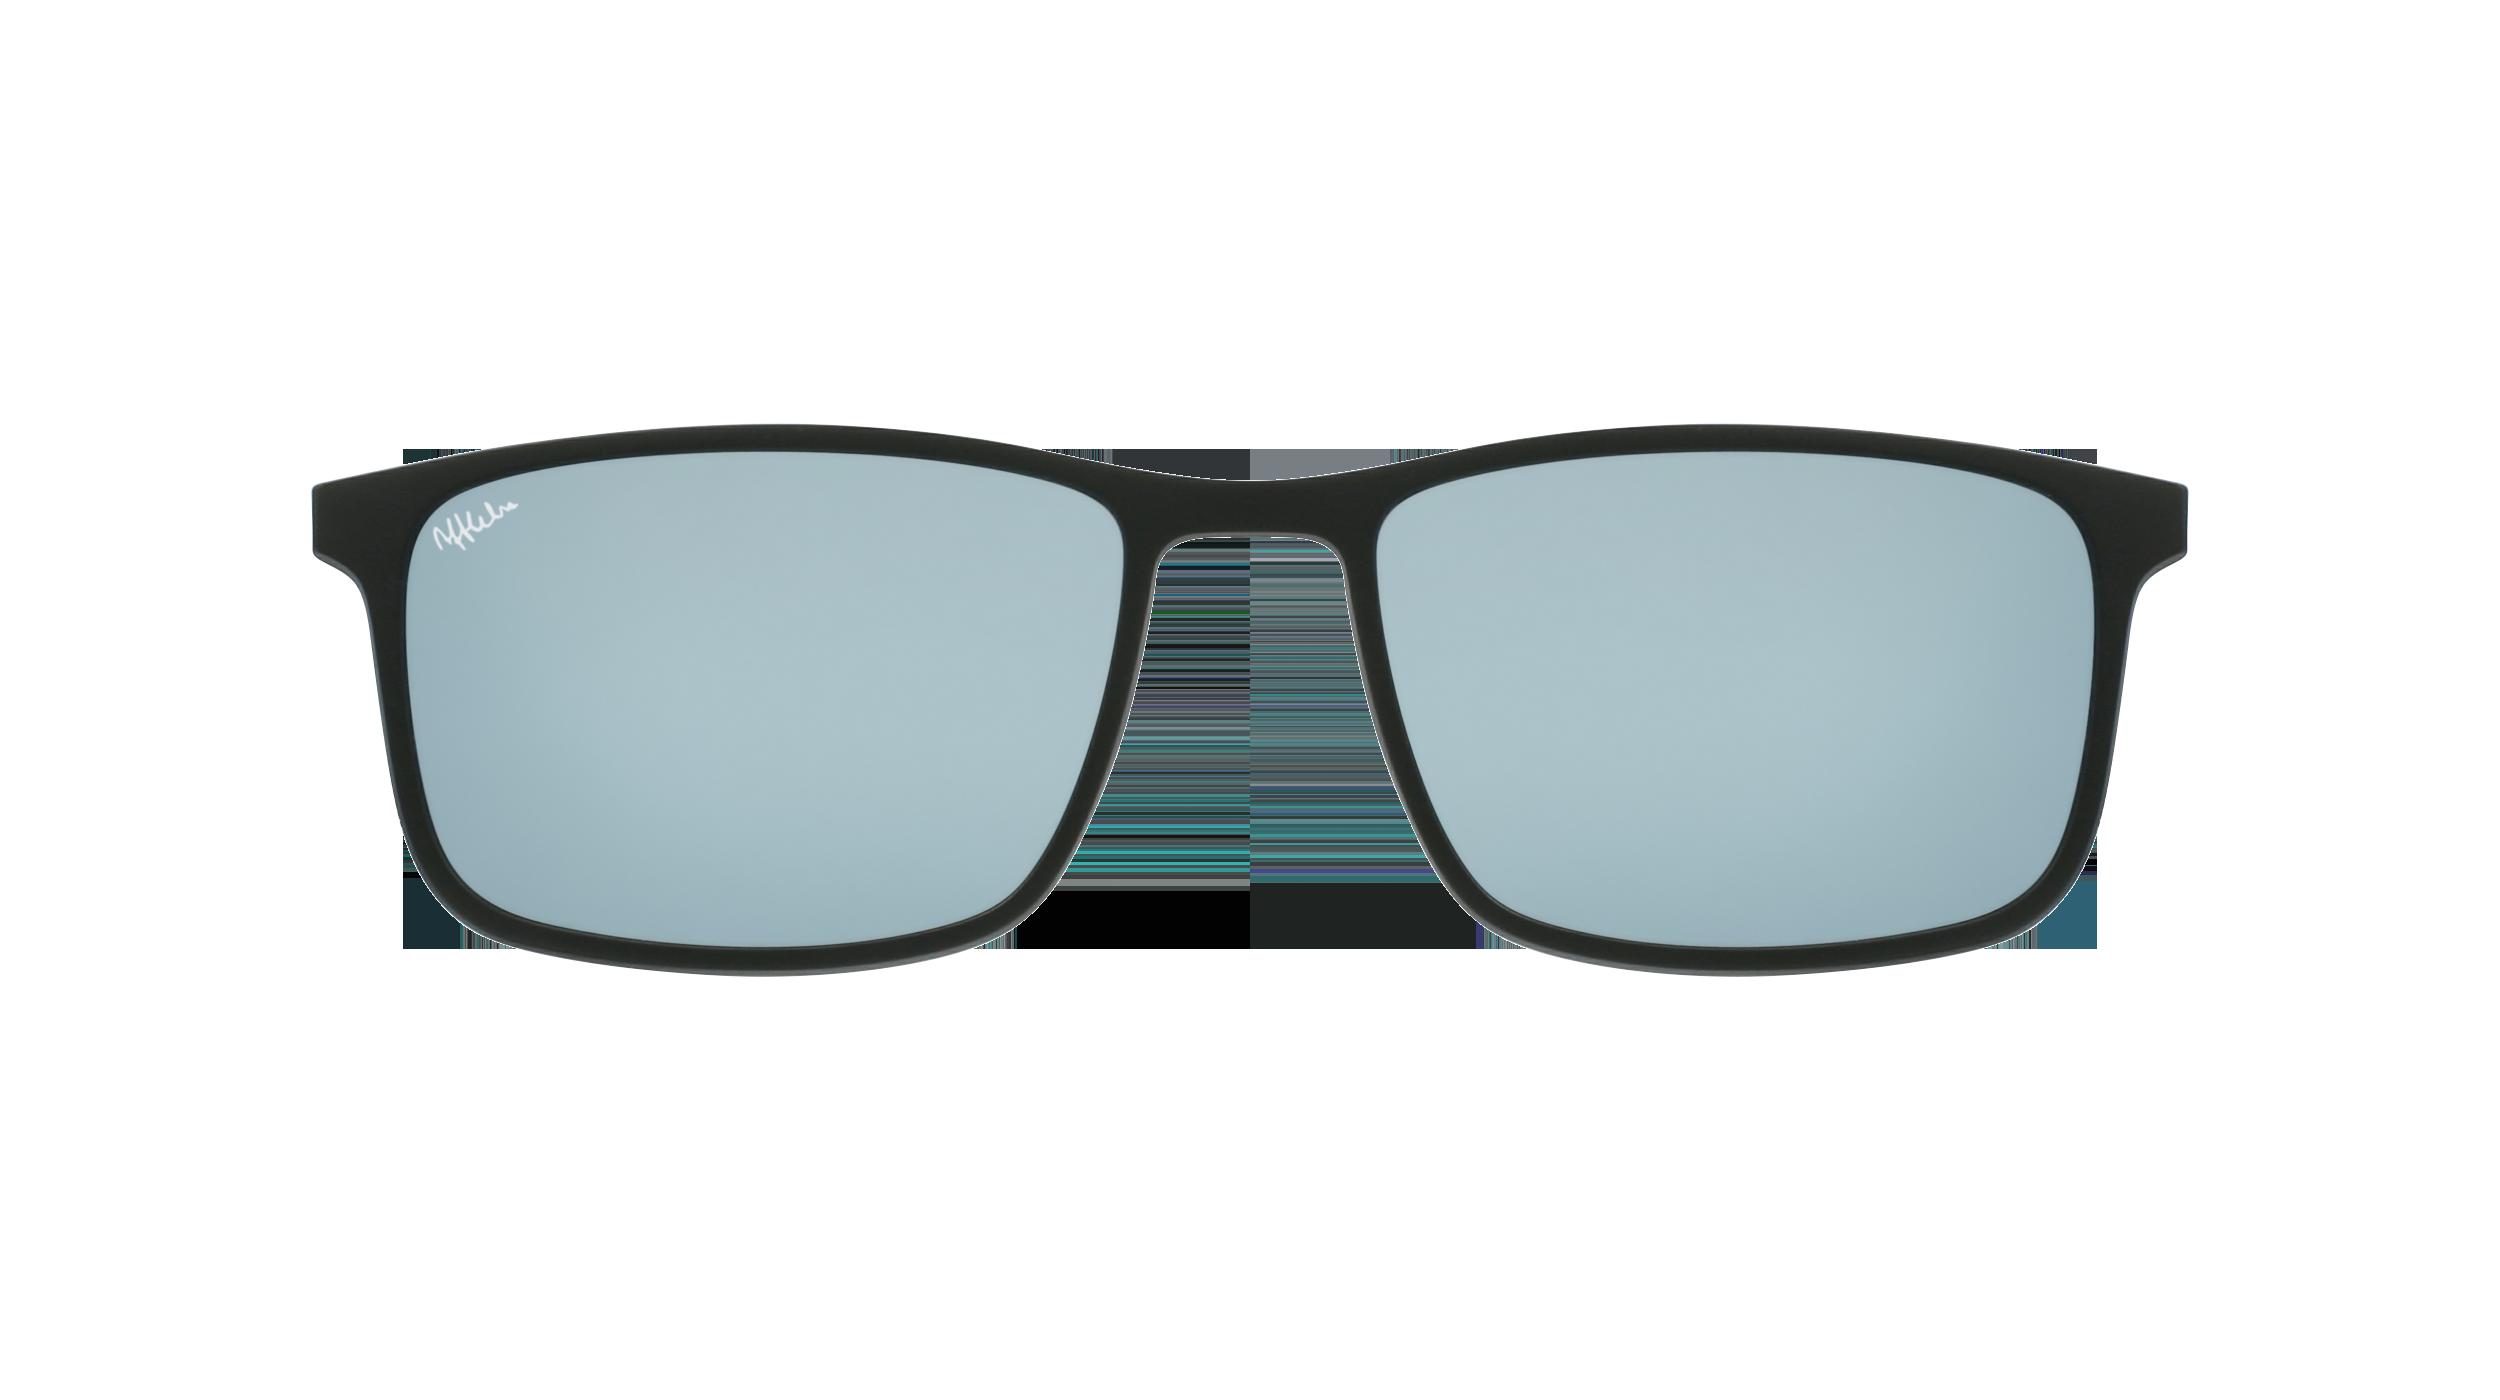 afflelou/france/products/smart_clip/clips_glasses/07630036458709.png